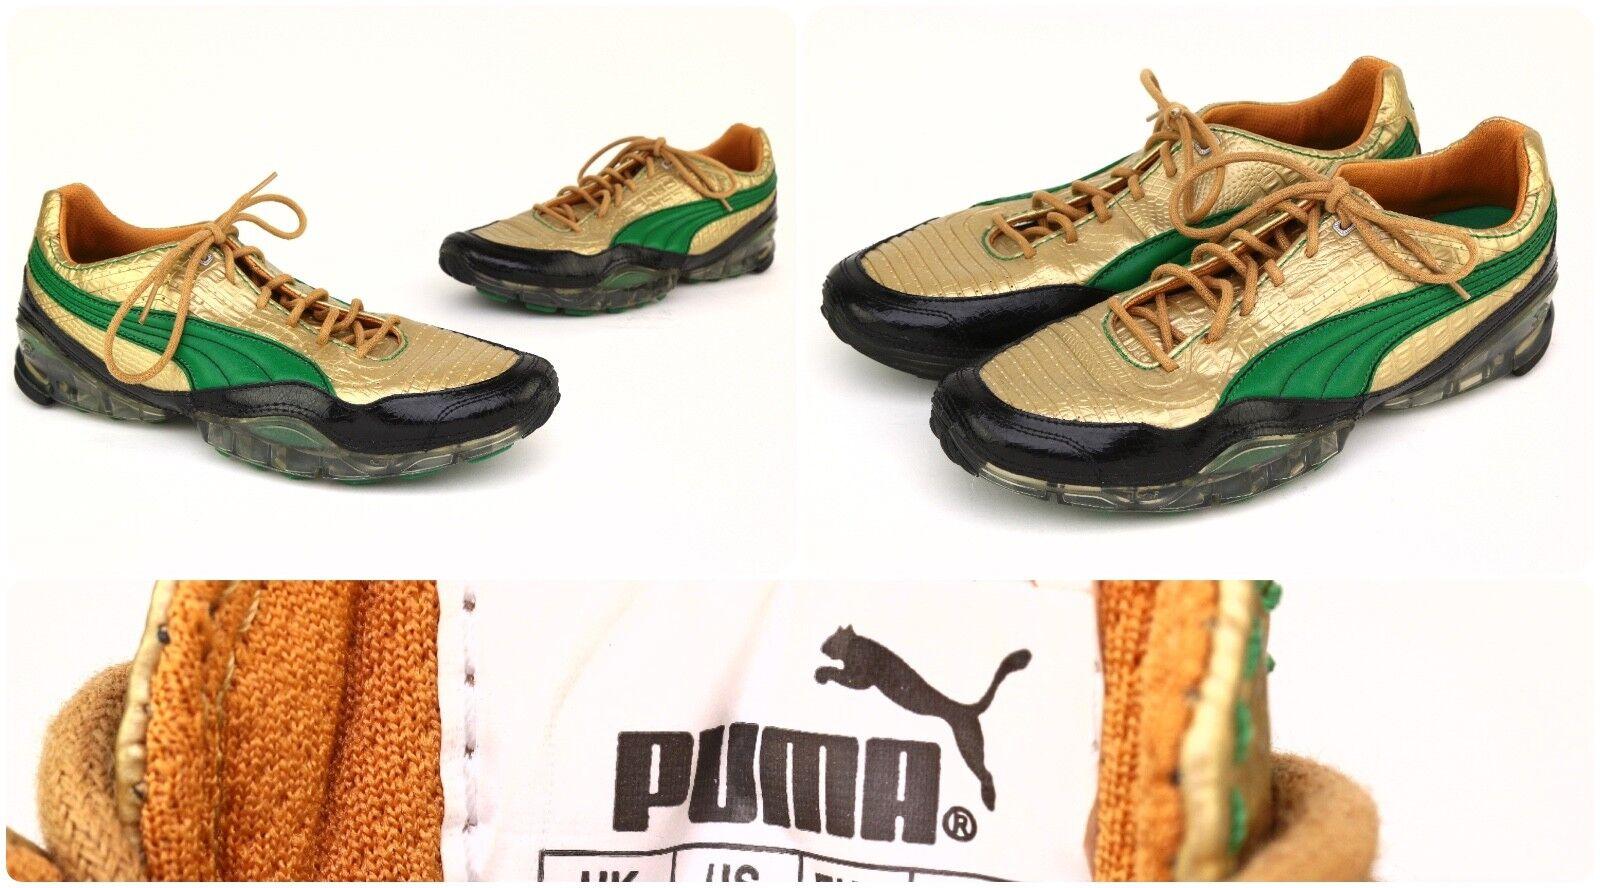 Puma Drift Cell Meio Metallic Croc Men's Sz 10 - 183486 01 -